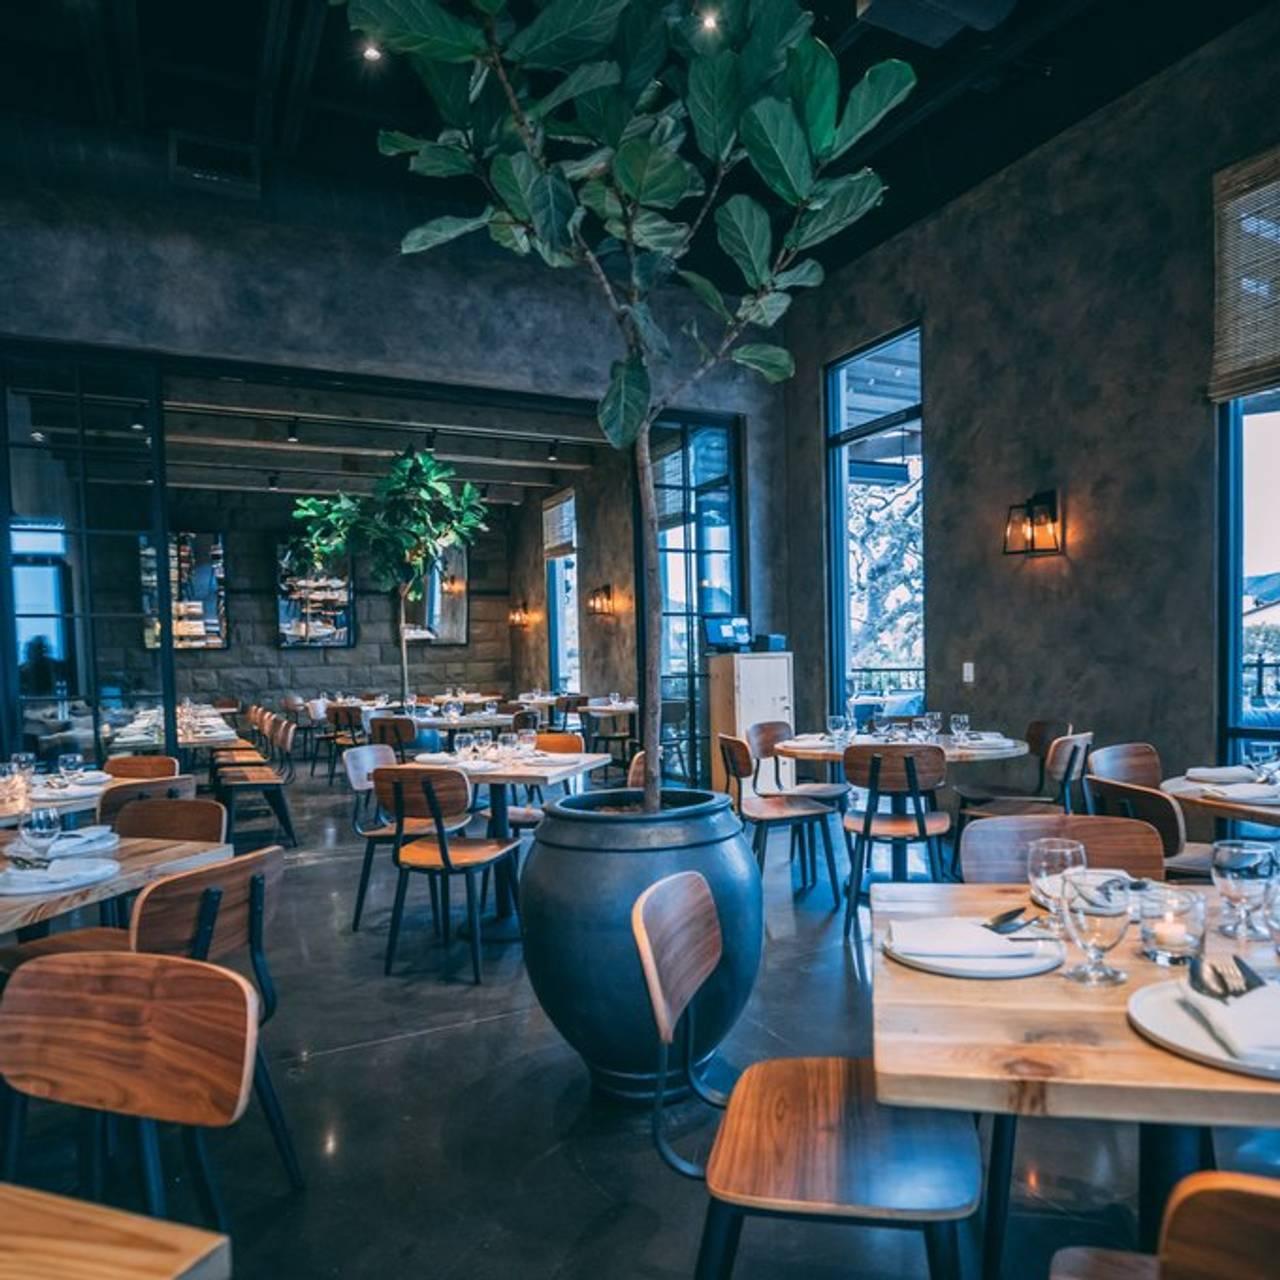 101 North Eatery & Bar Restaurant - Westlake Village, CA | OpenTable